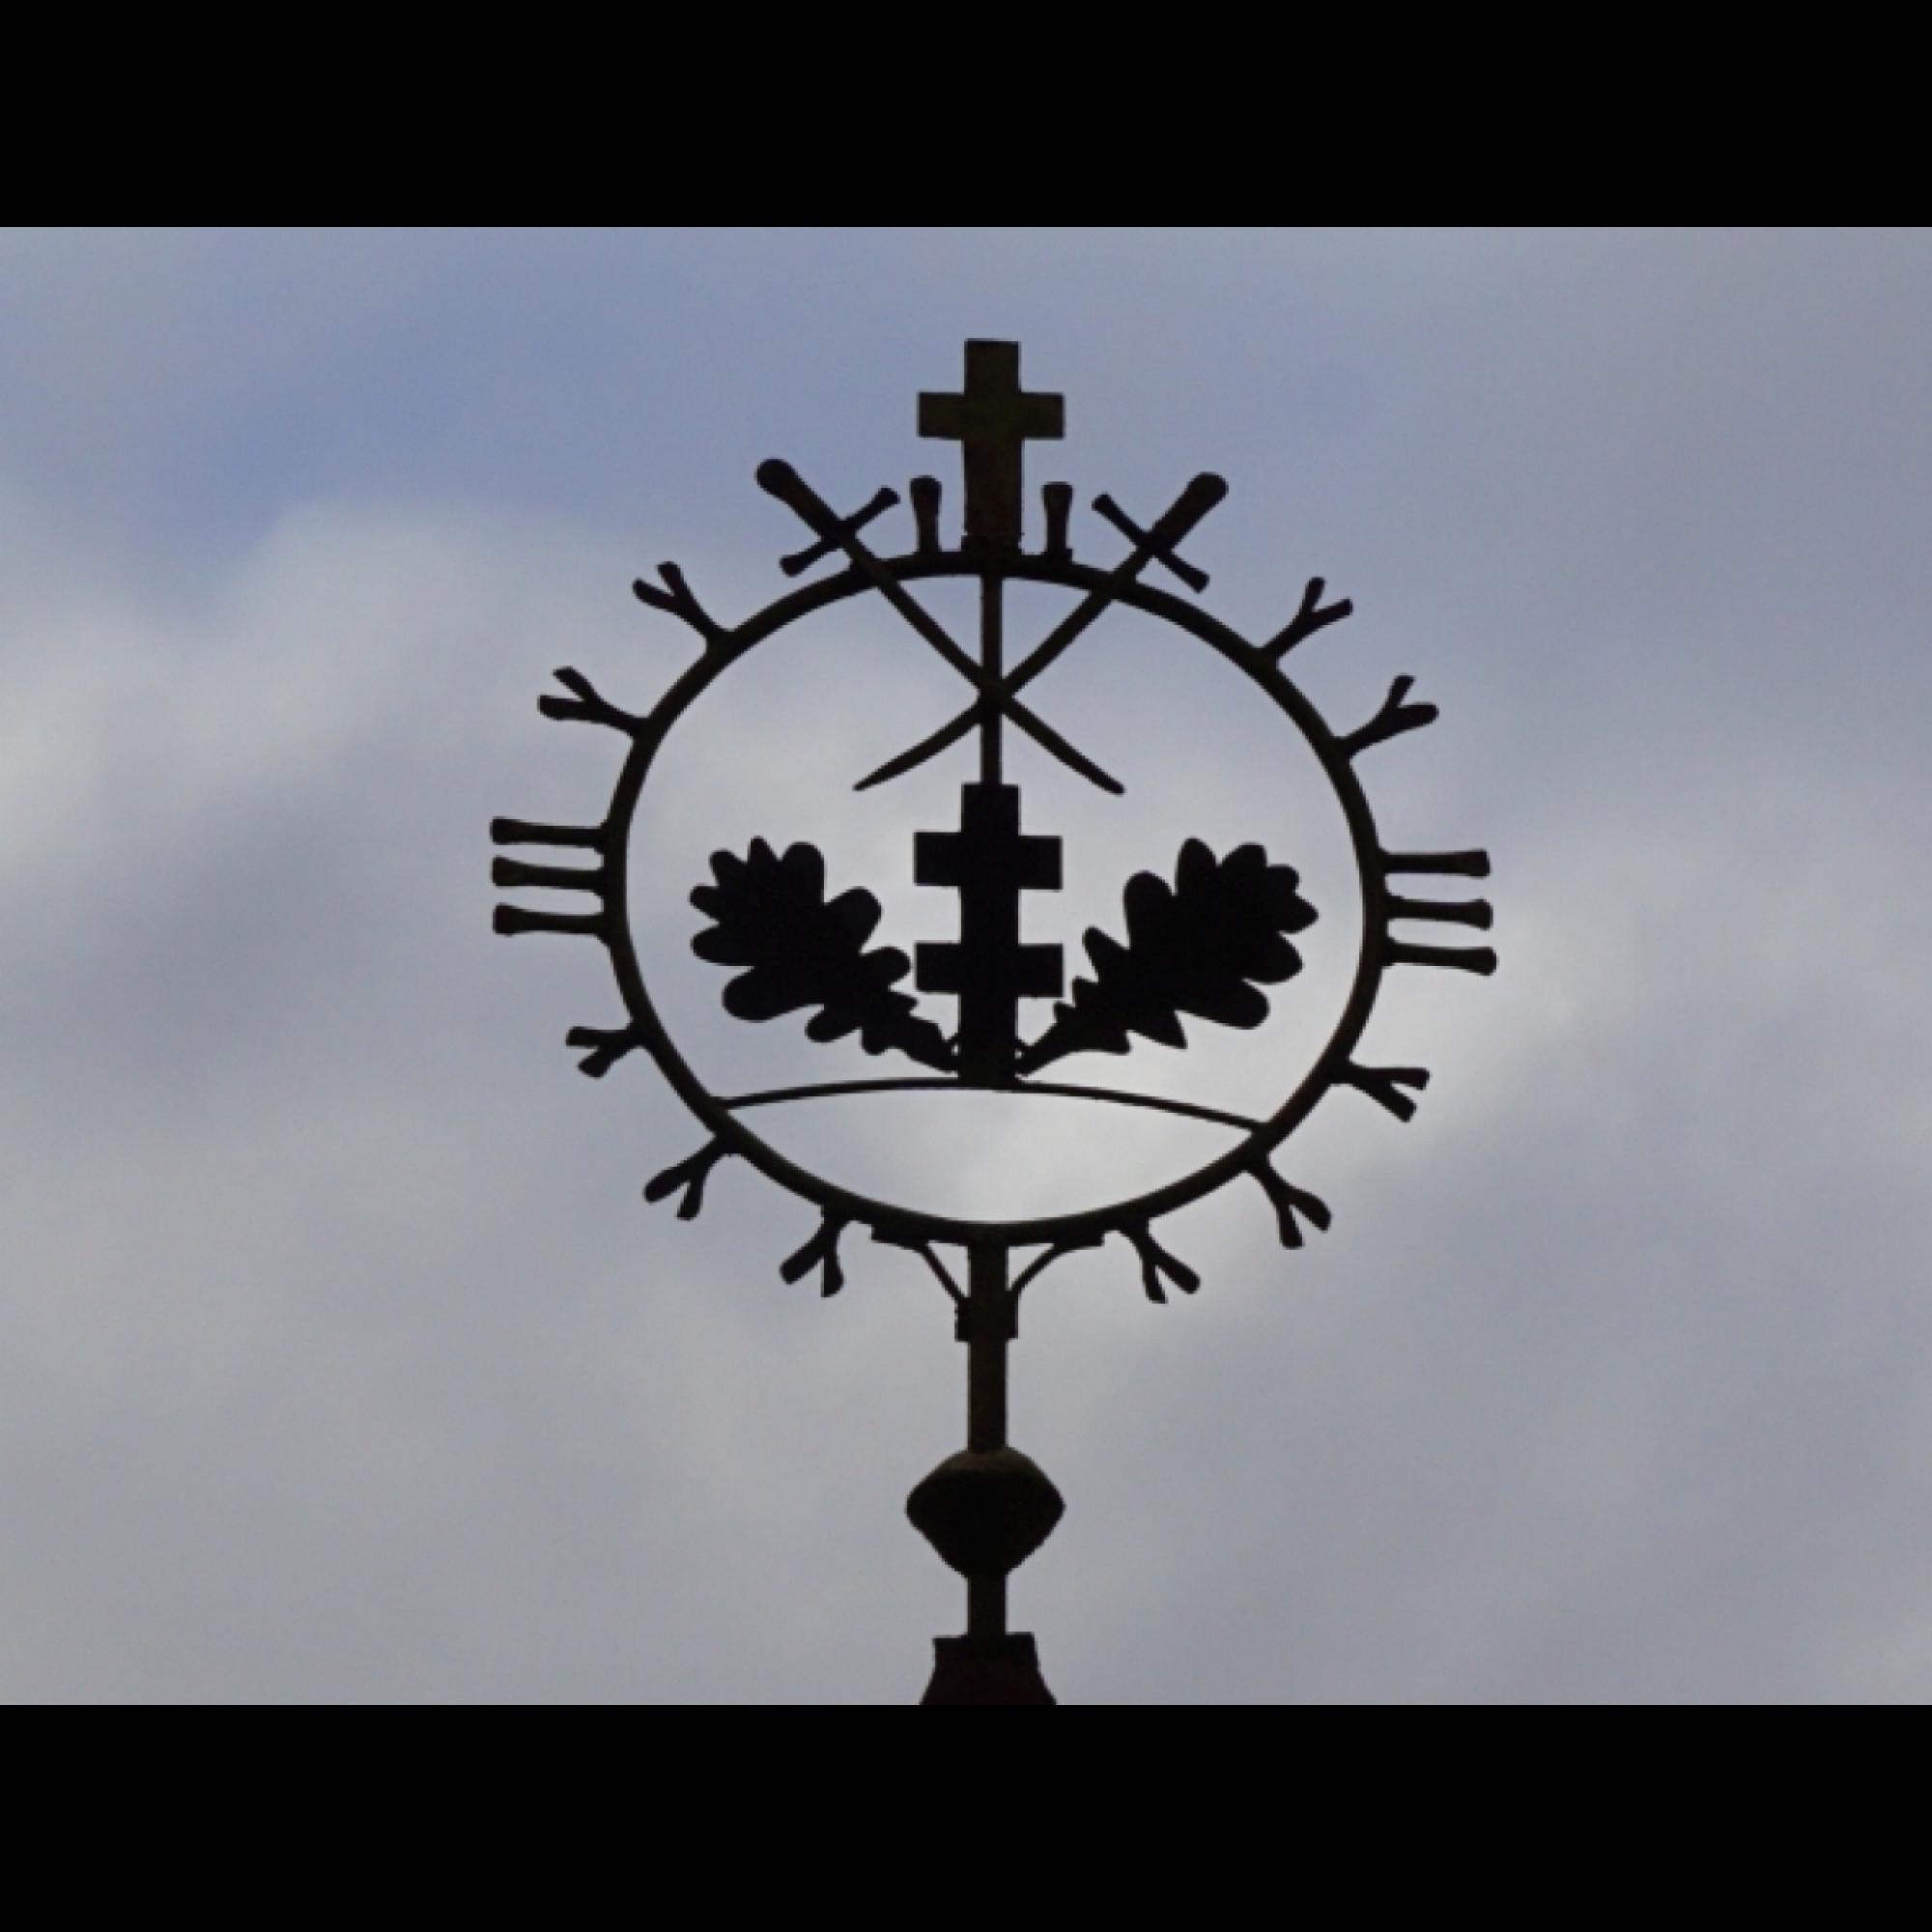 Kovų už laisvę atminimo ženklai Kartenoje